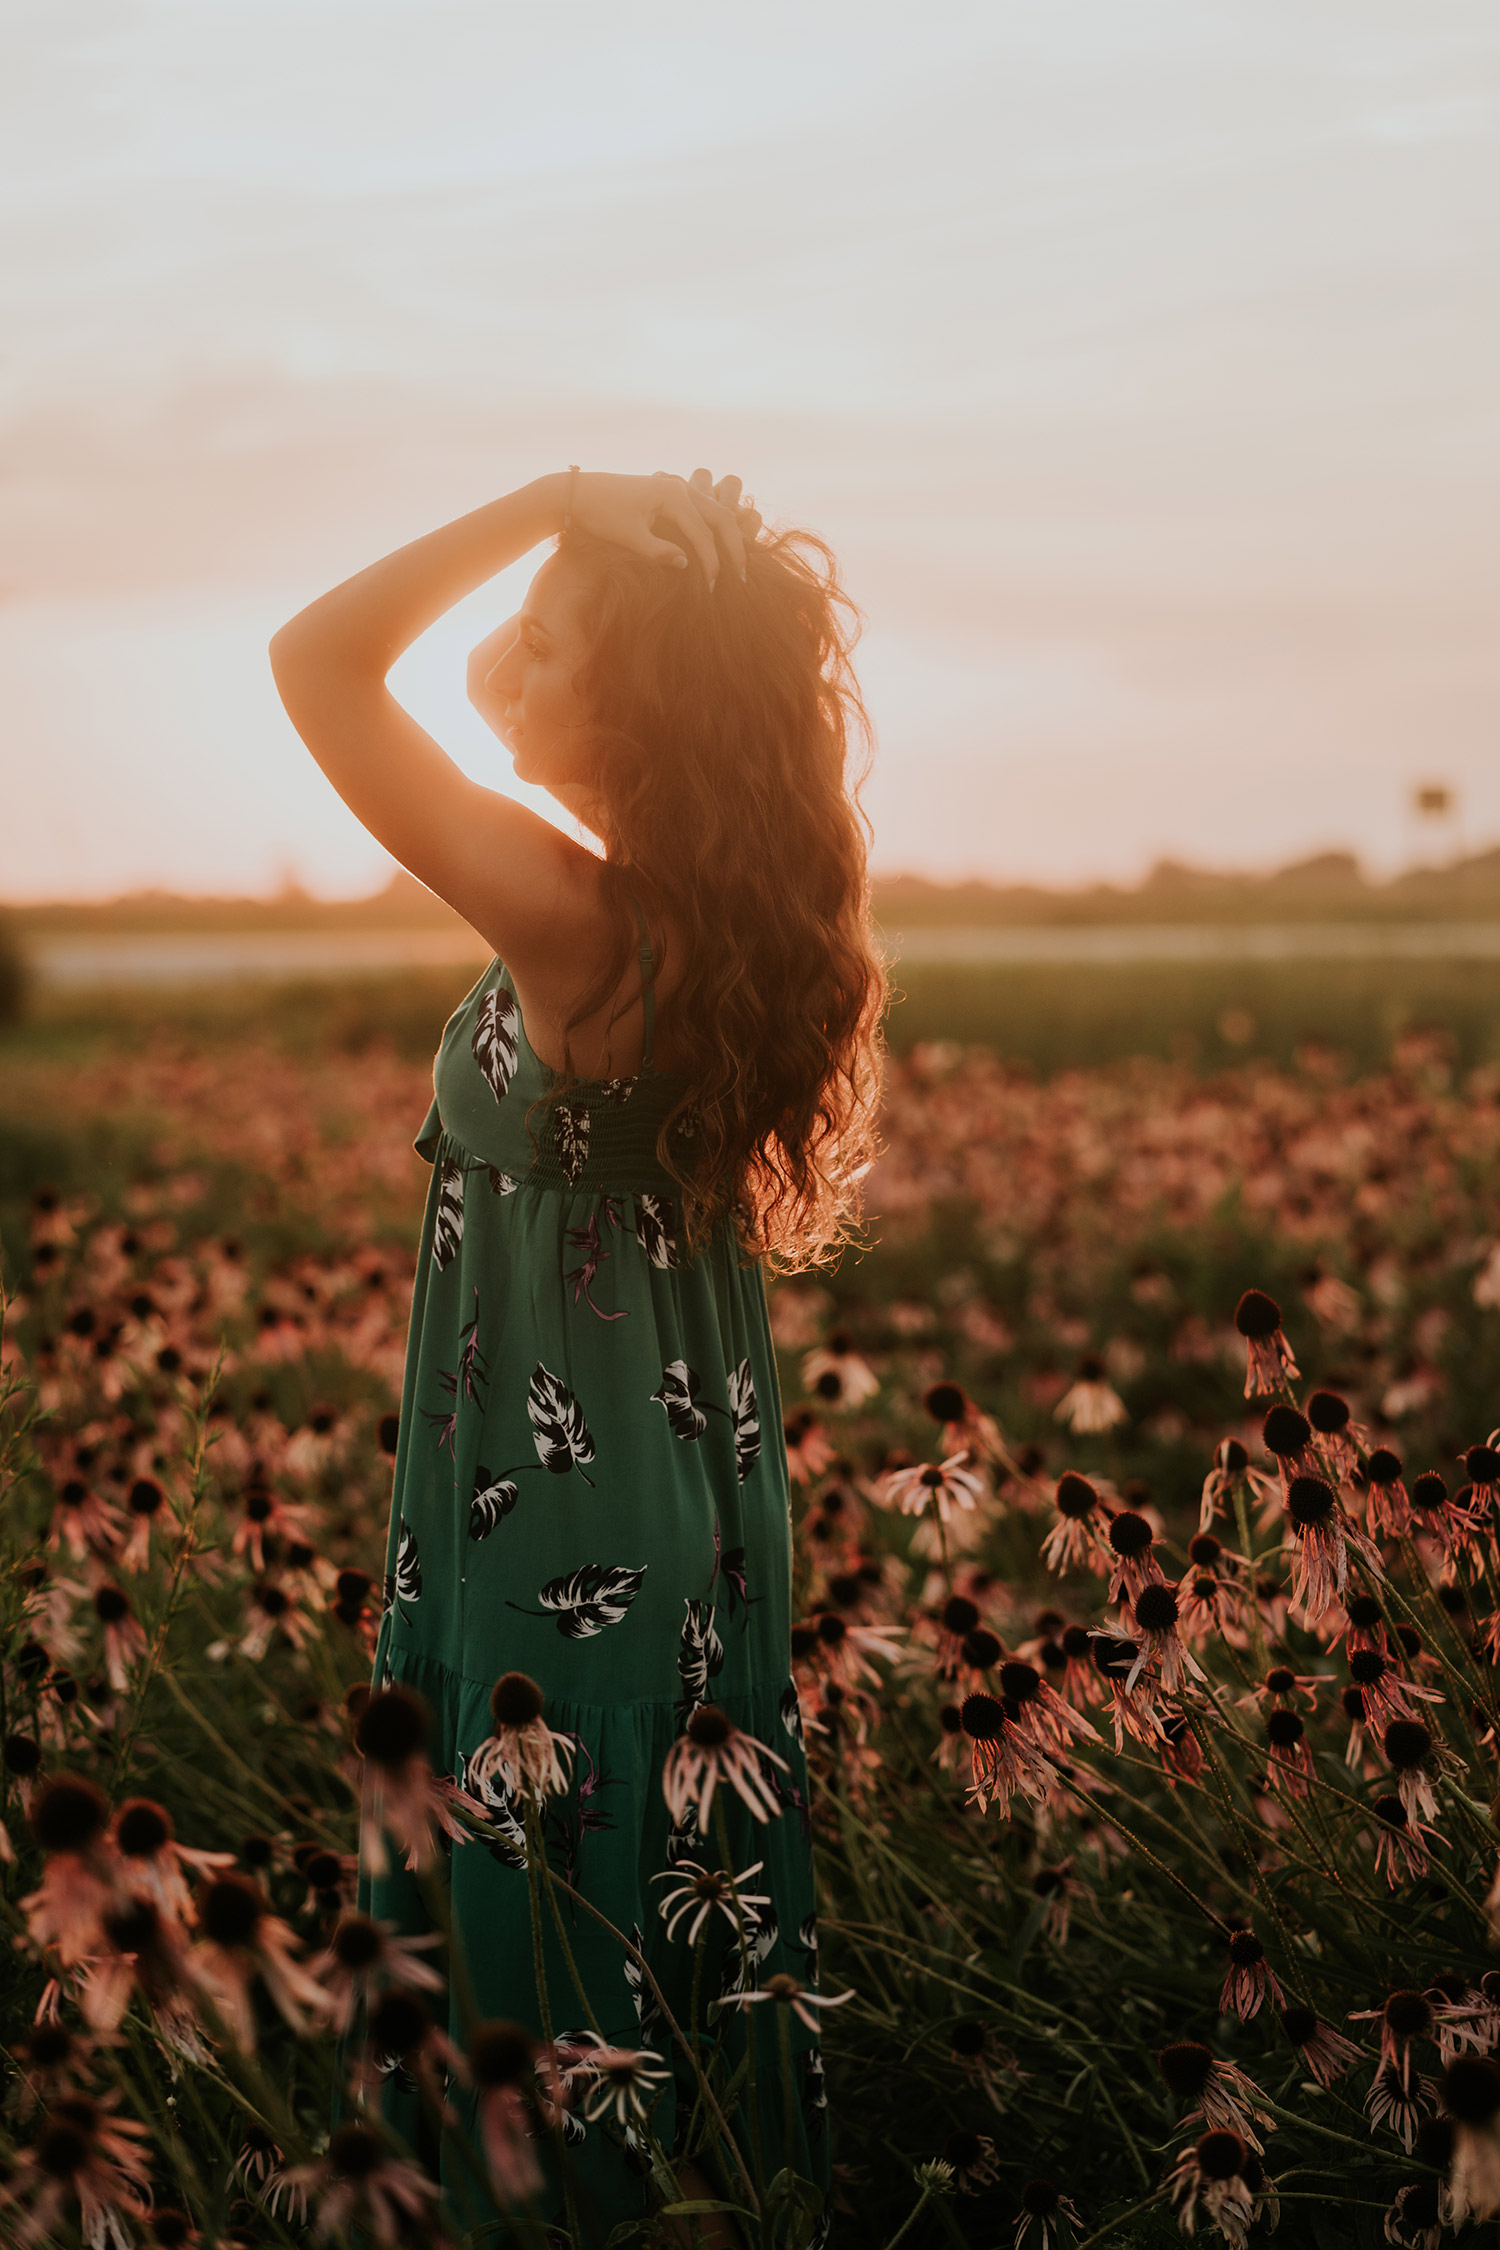 lizzy-senior--girl-flower-field-holding-hair-winterset-ankeny-high-school-desmoines-iowa-raelyn-ramey-photography-128.jpg